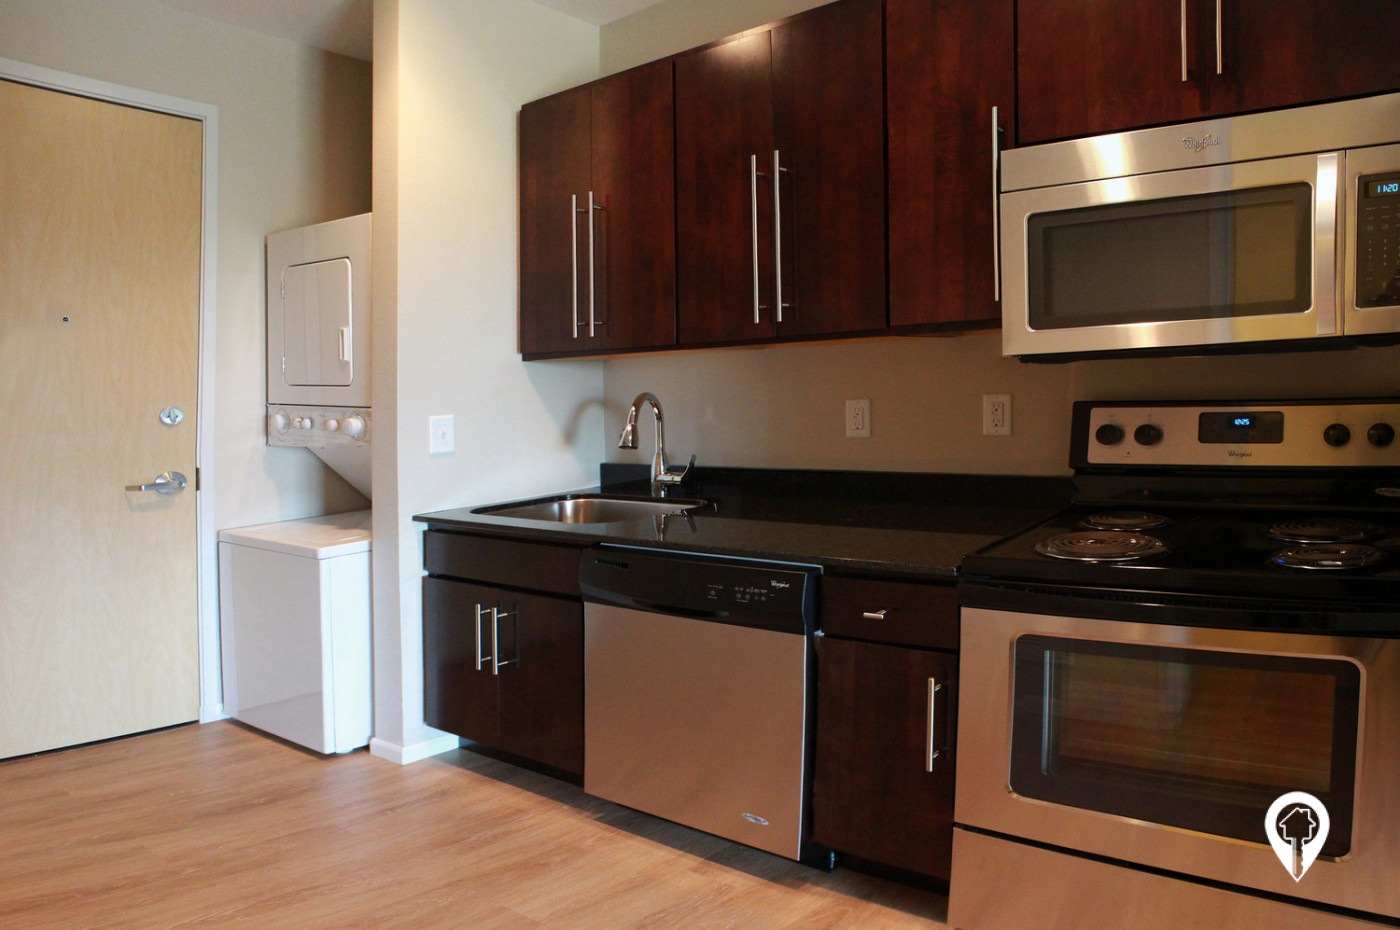 Northridge-Apartment-Homes-Open-floorplans-perfect-entertaining-guests